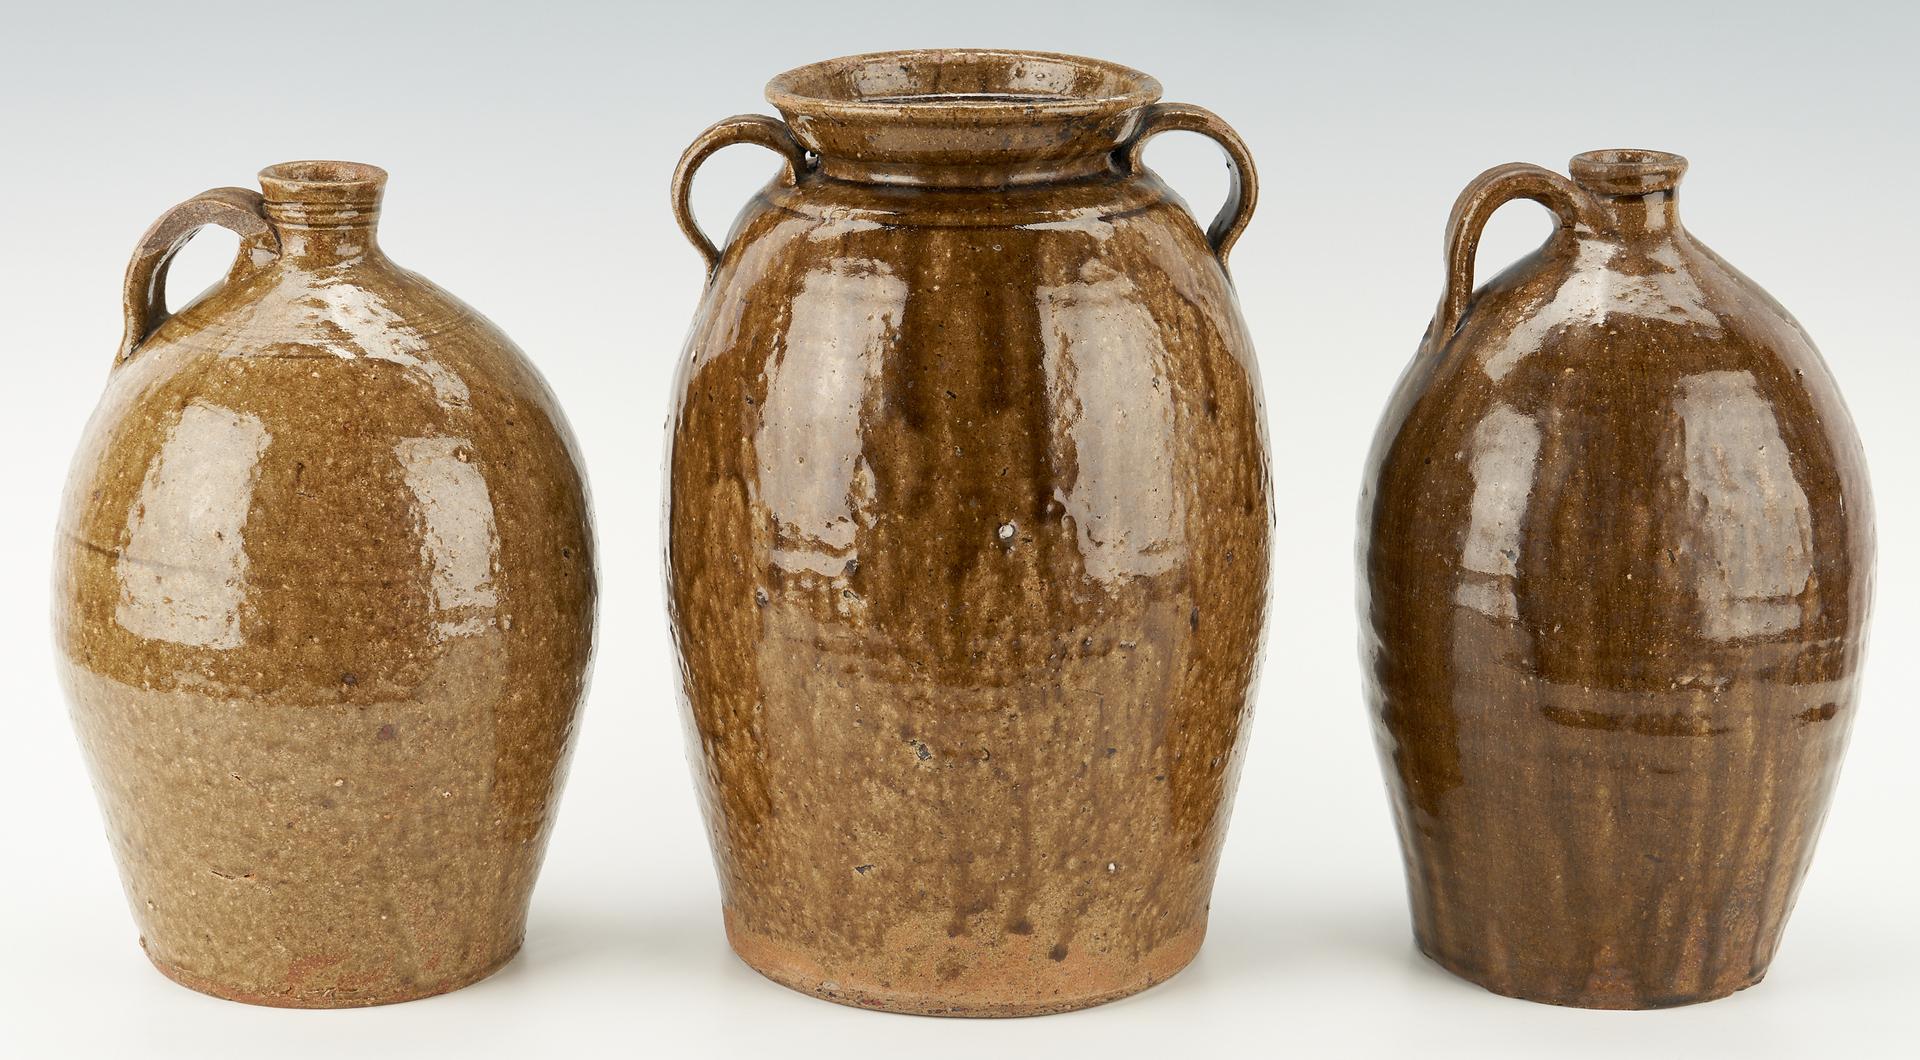 Lot 1039: 3 North Carolina Alkaline Glaze Pottery Items